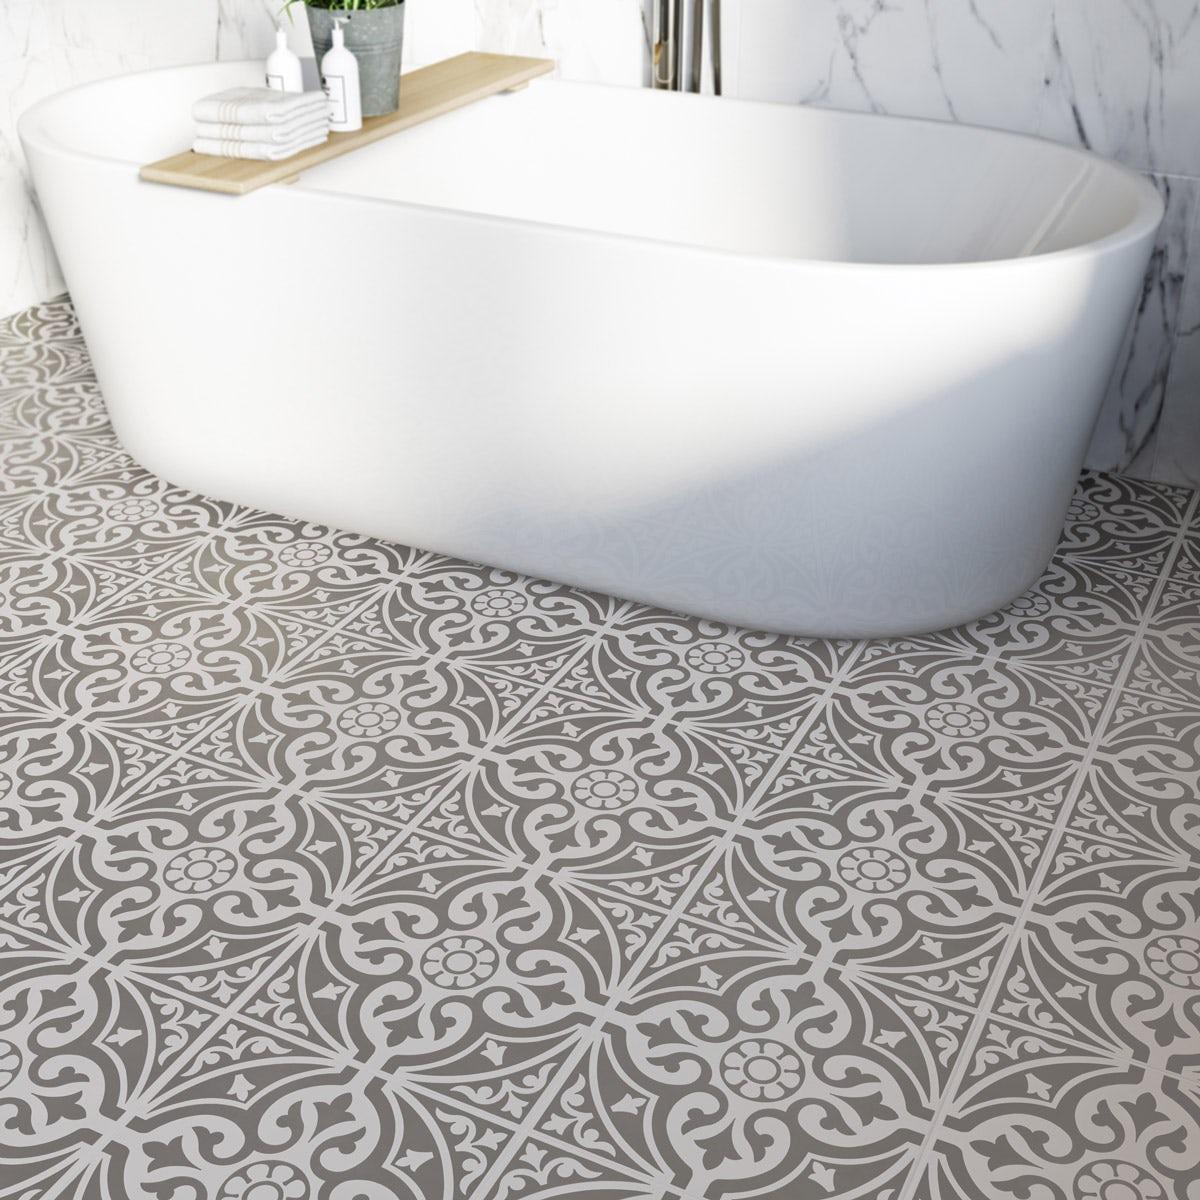 British Ceramic Tile Victoriana feature grey matt floor tile 331mm x 331mm